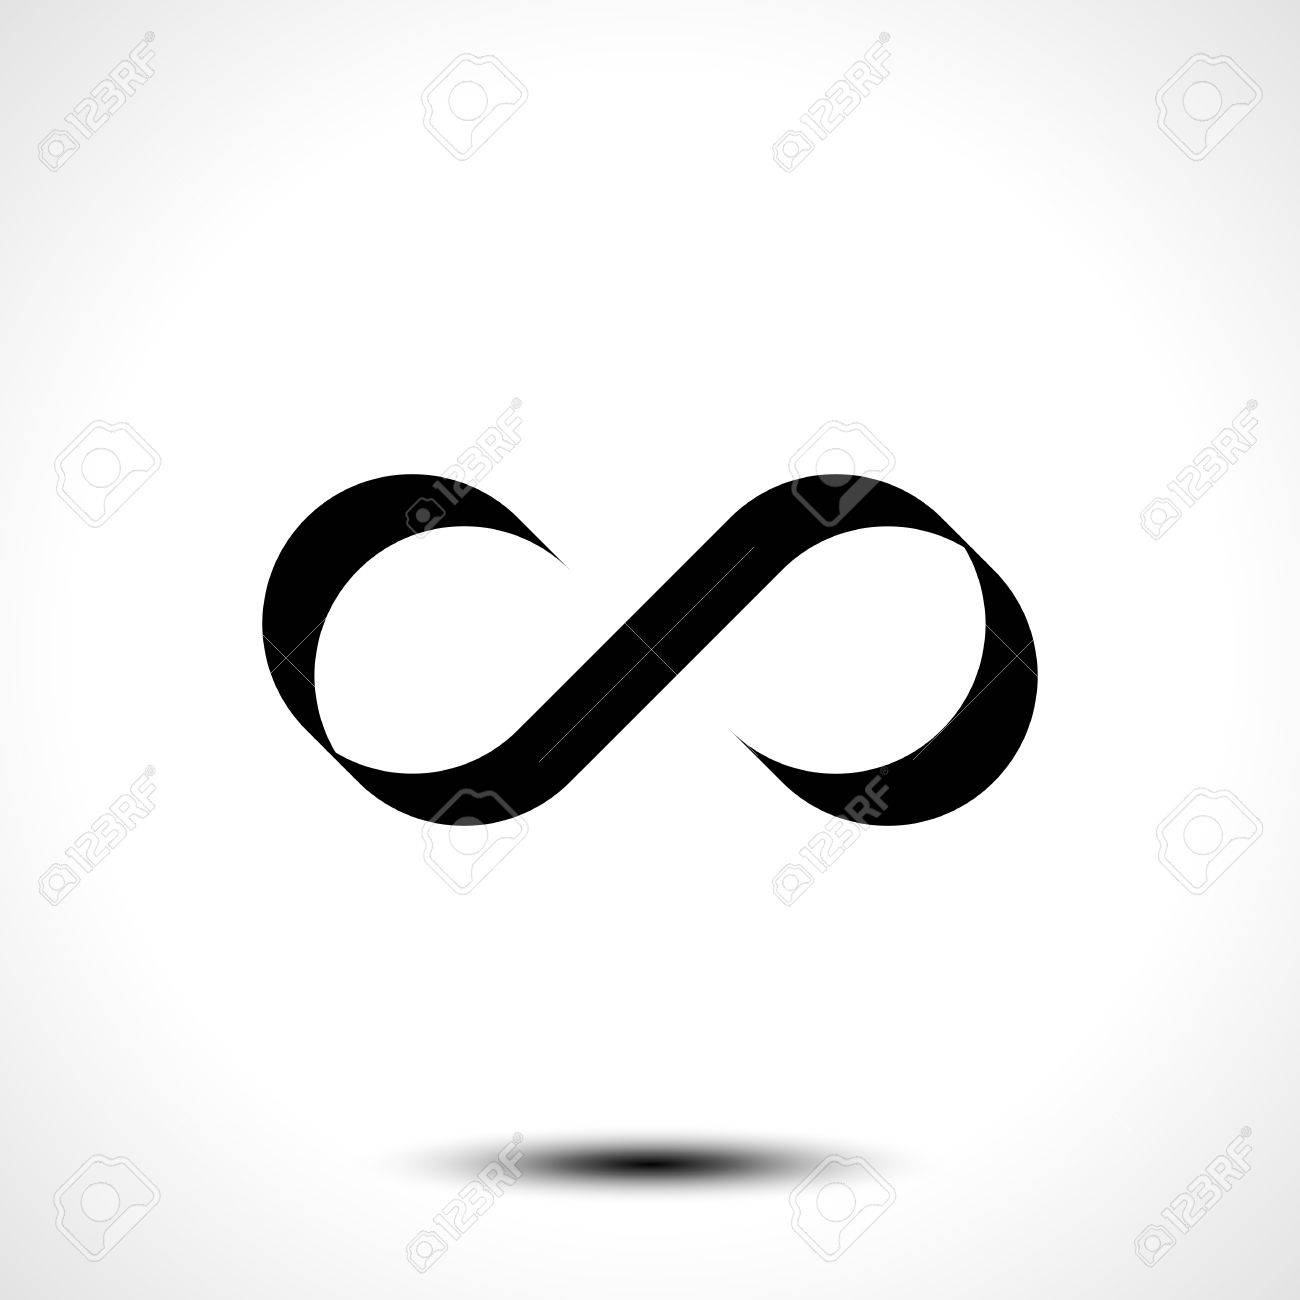 Math Infinity Symbol Infiniti Car